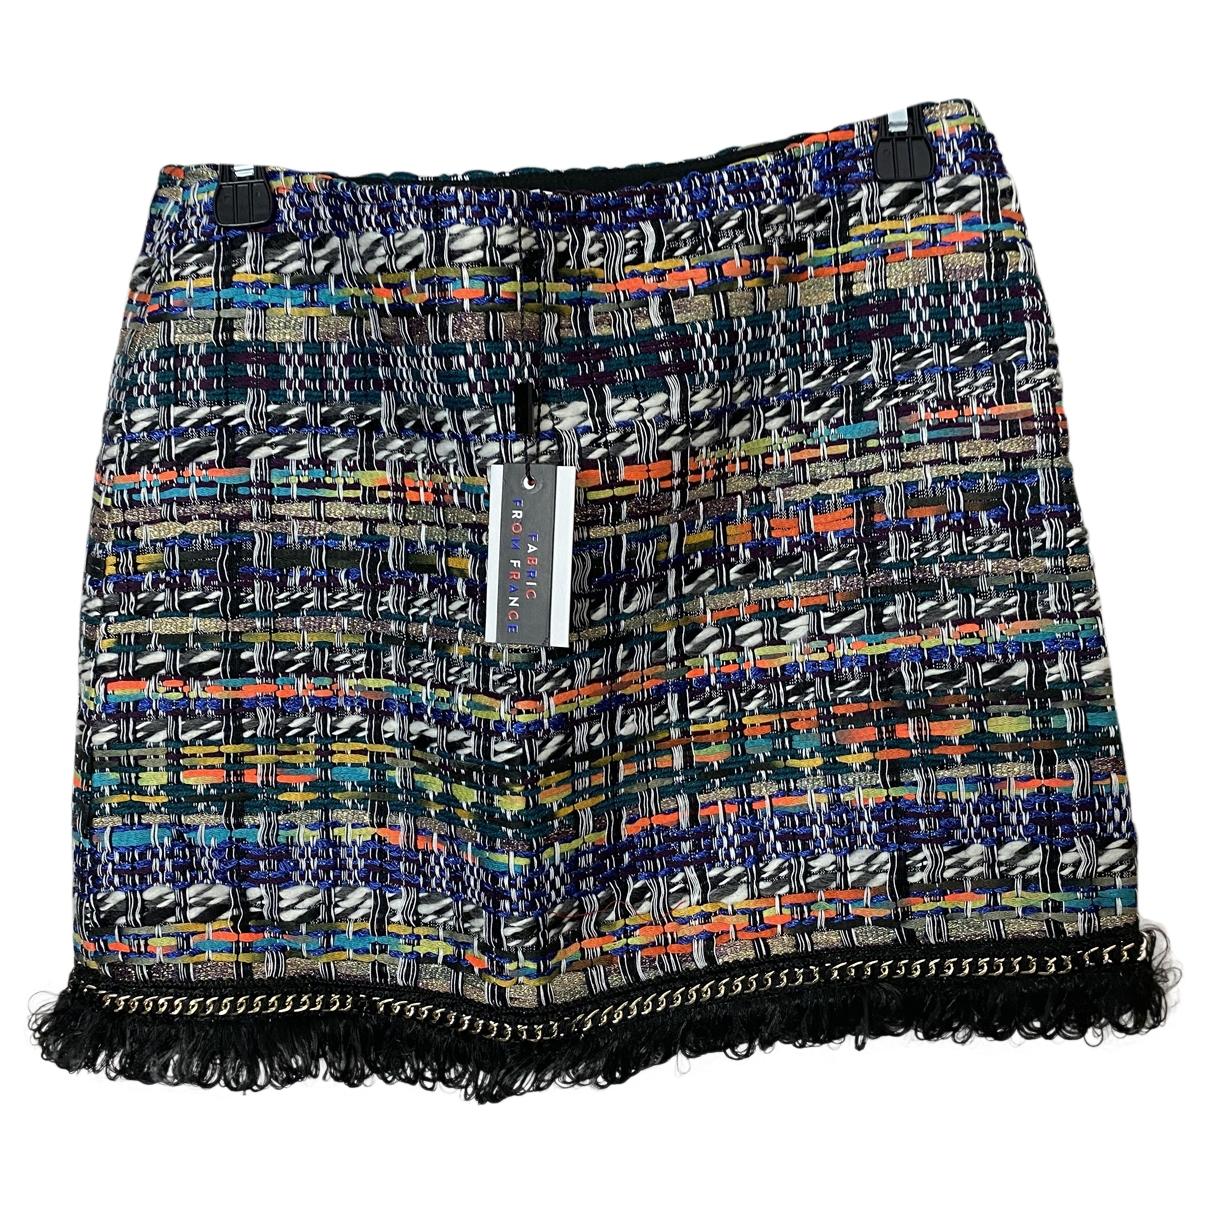 Milly \N Multicolour Tweed skirt for Women 2 US